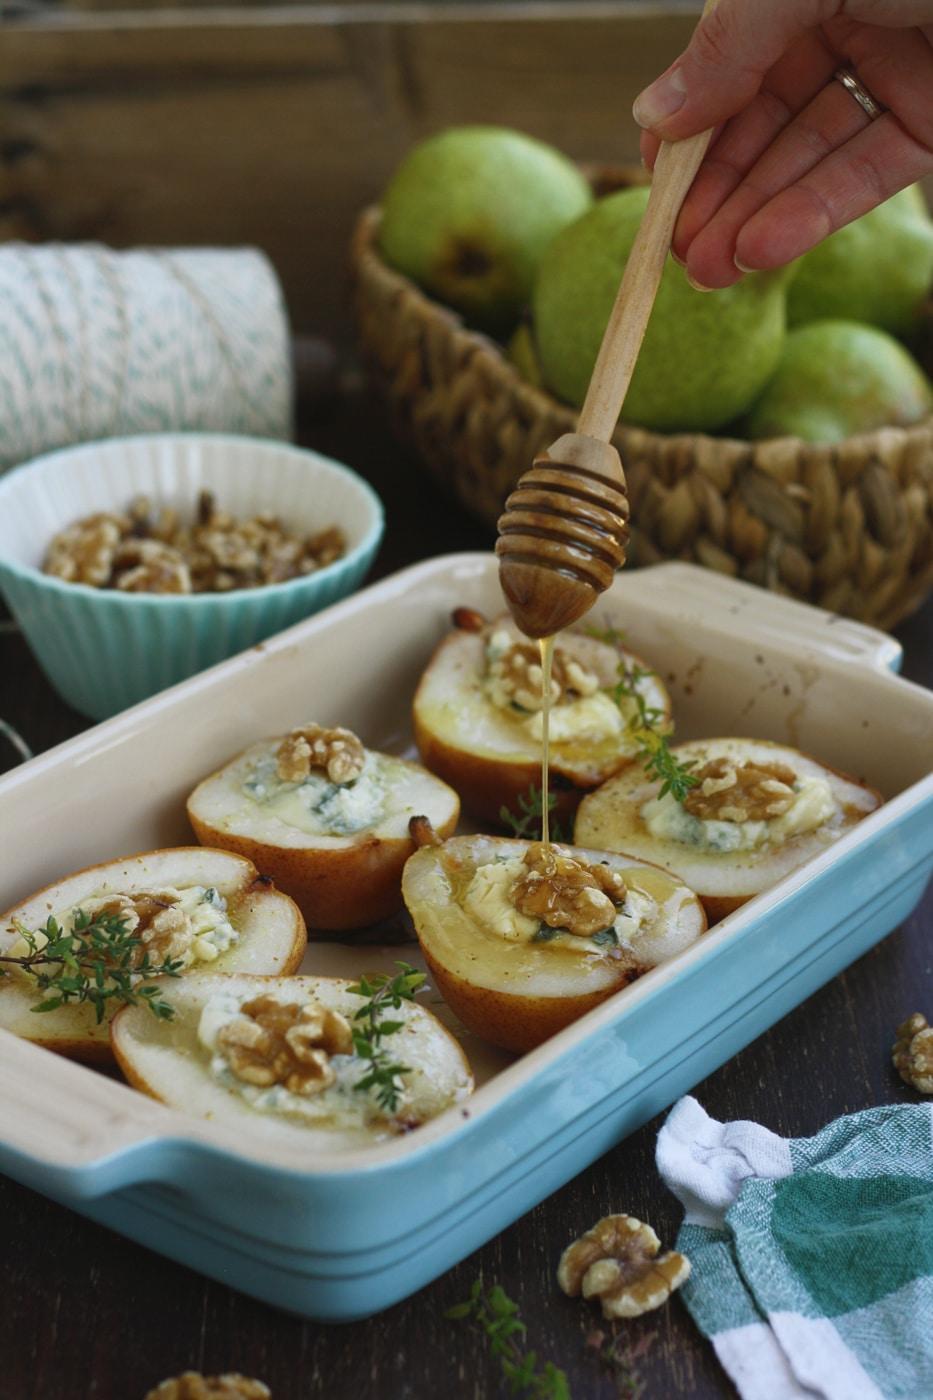 Baked Pears with Gorgonzola & Honey from Happy Kitchen. Rocks